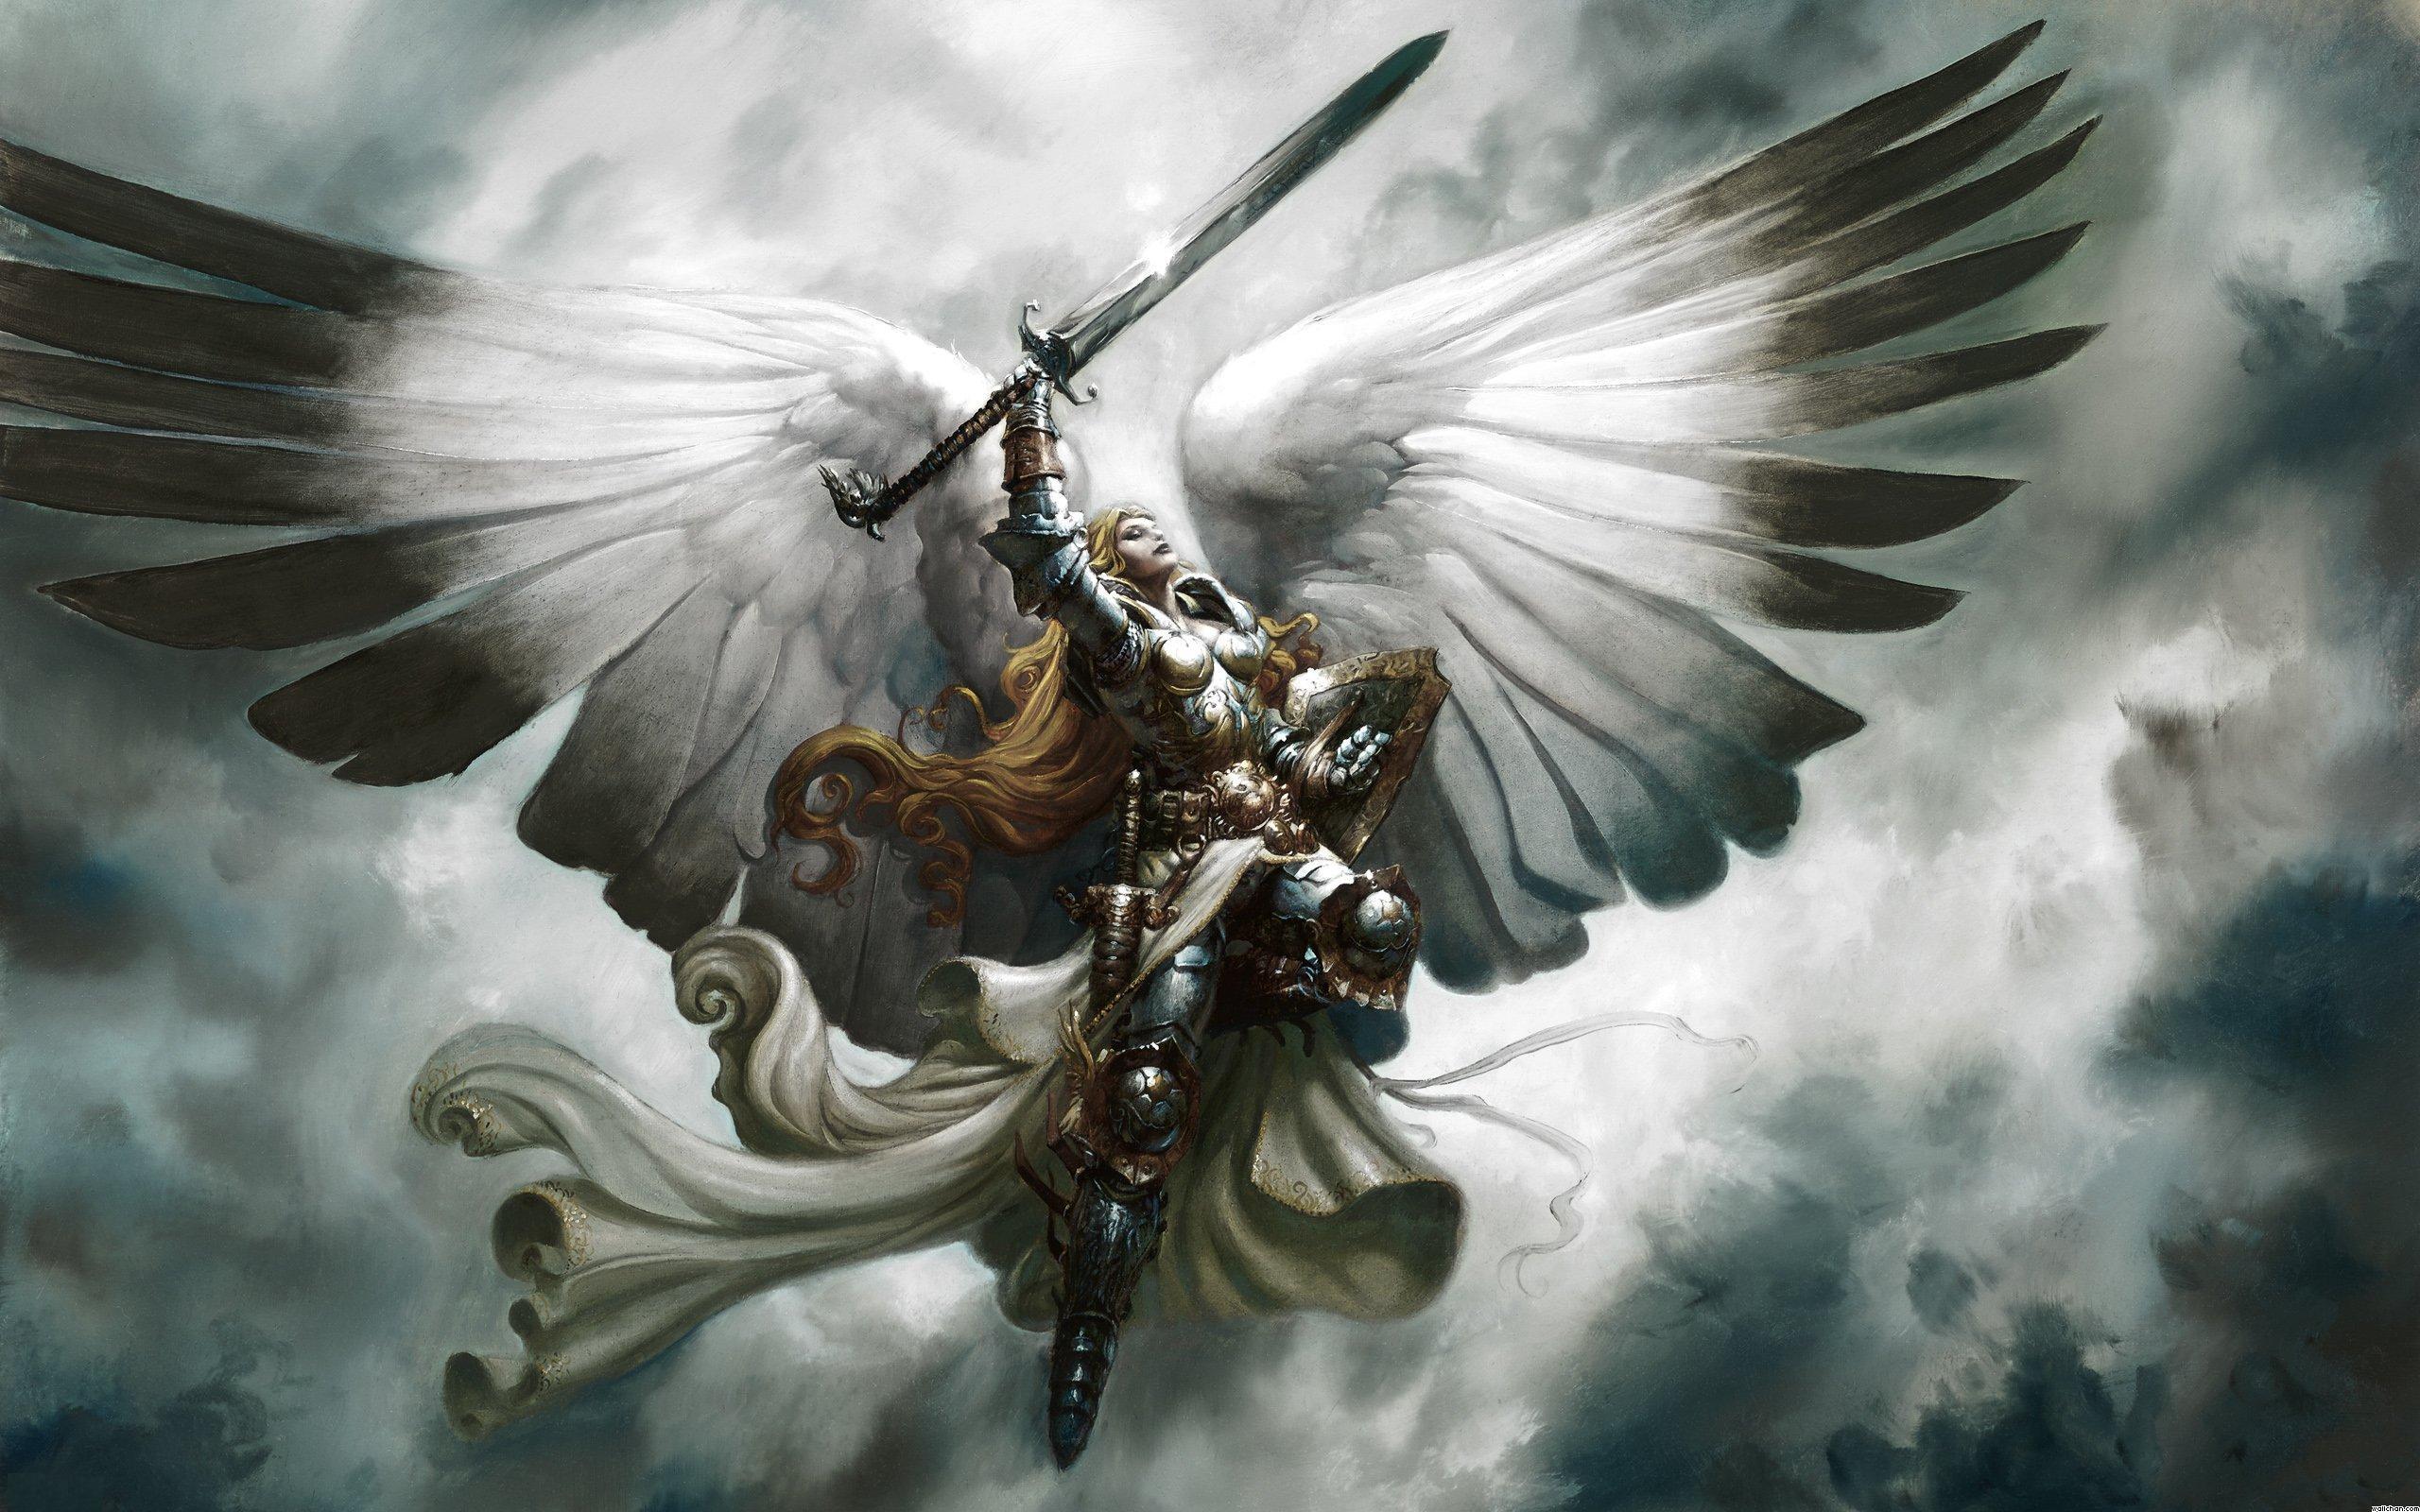 General 2560x1600 Magic: The Gathering sword angel armor women wings fantasy art closed eyes Serra Angel